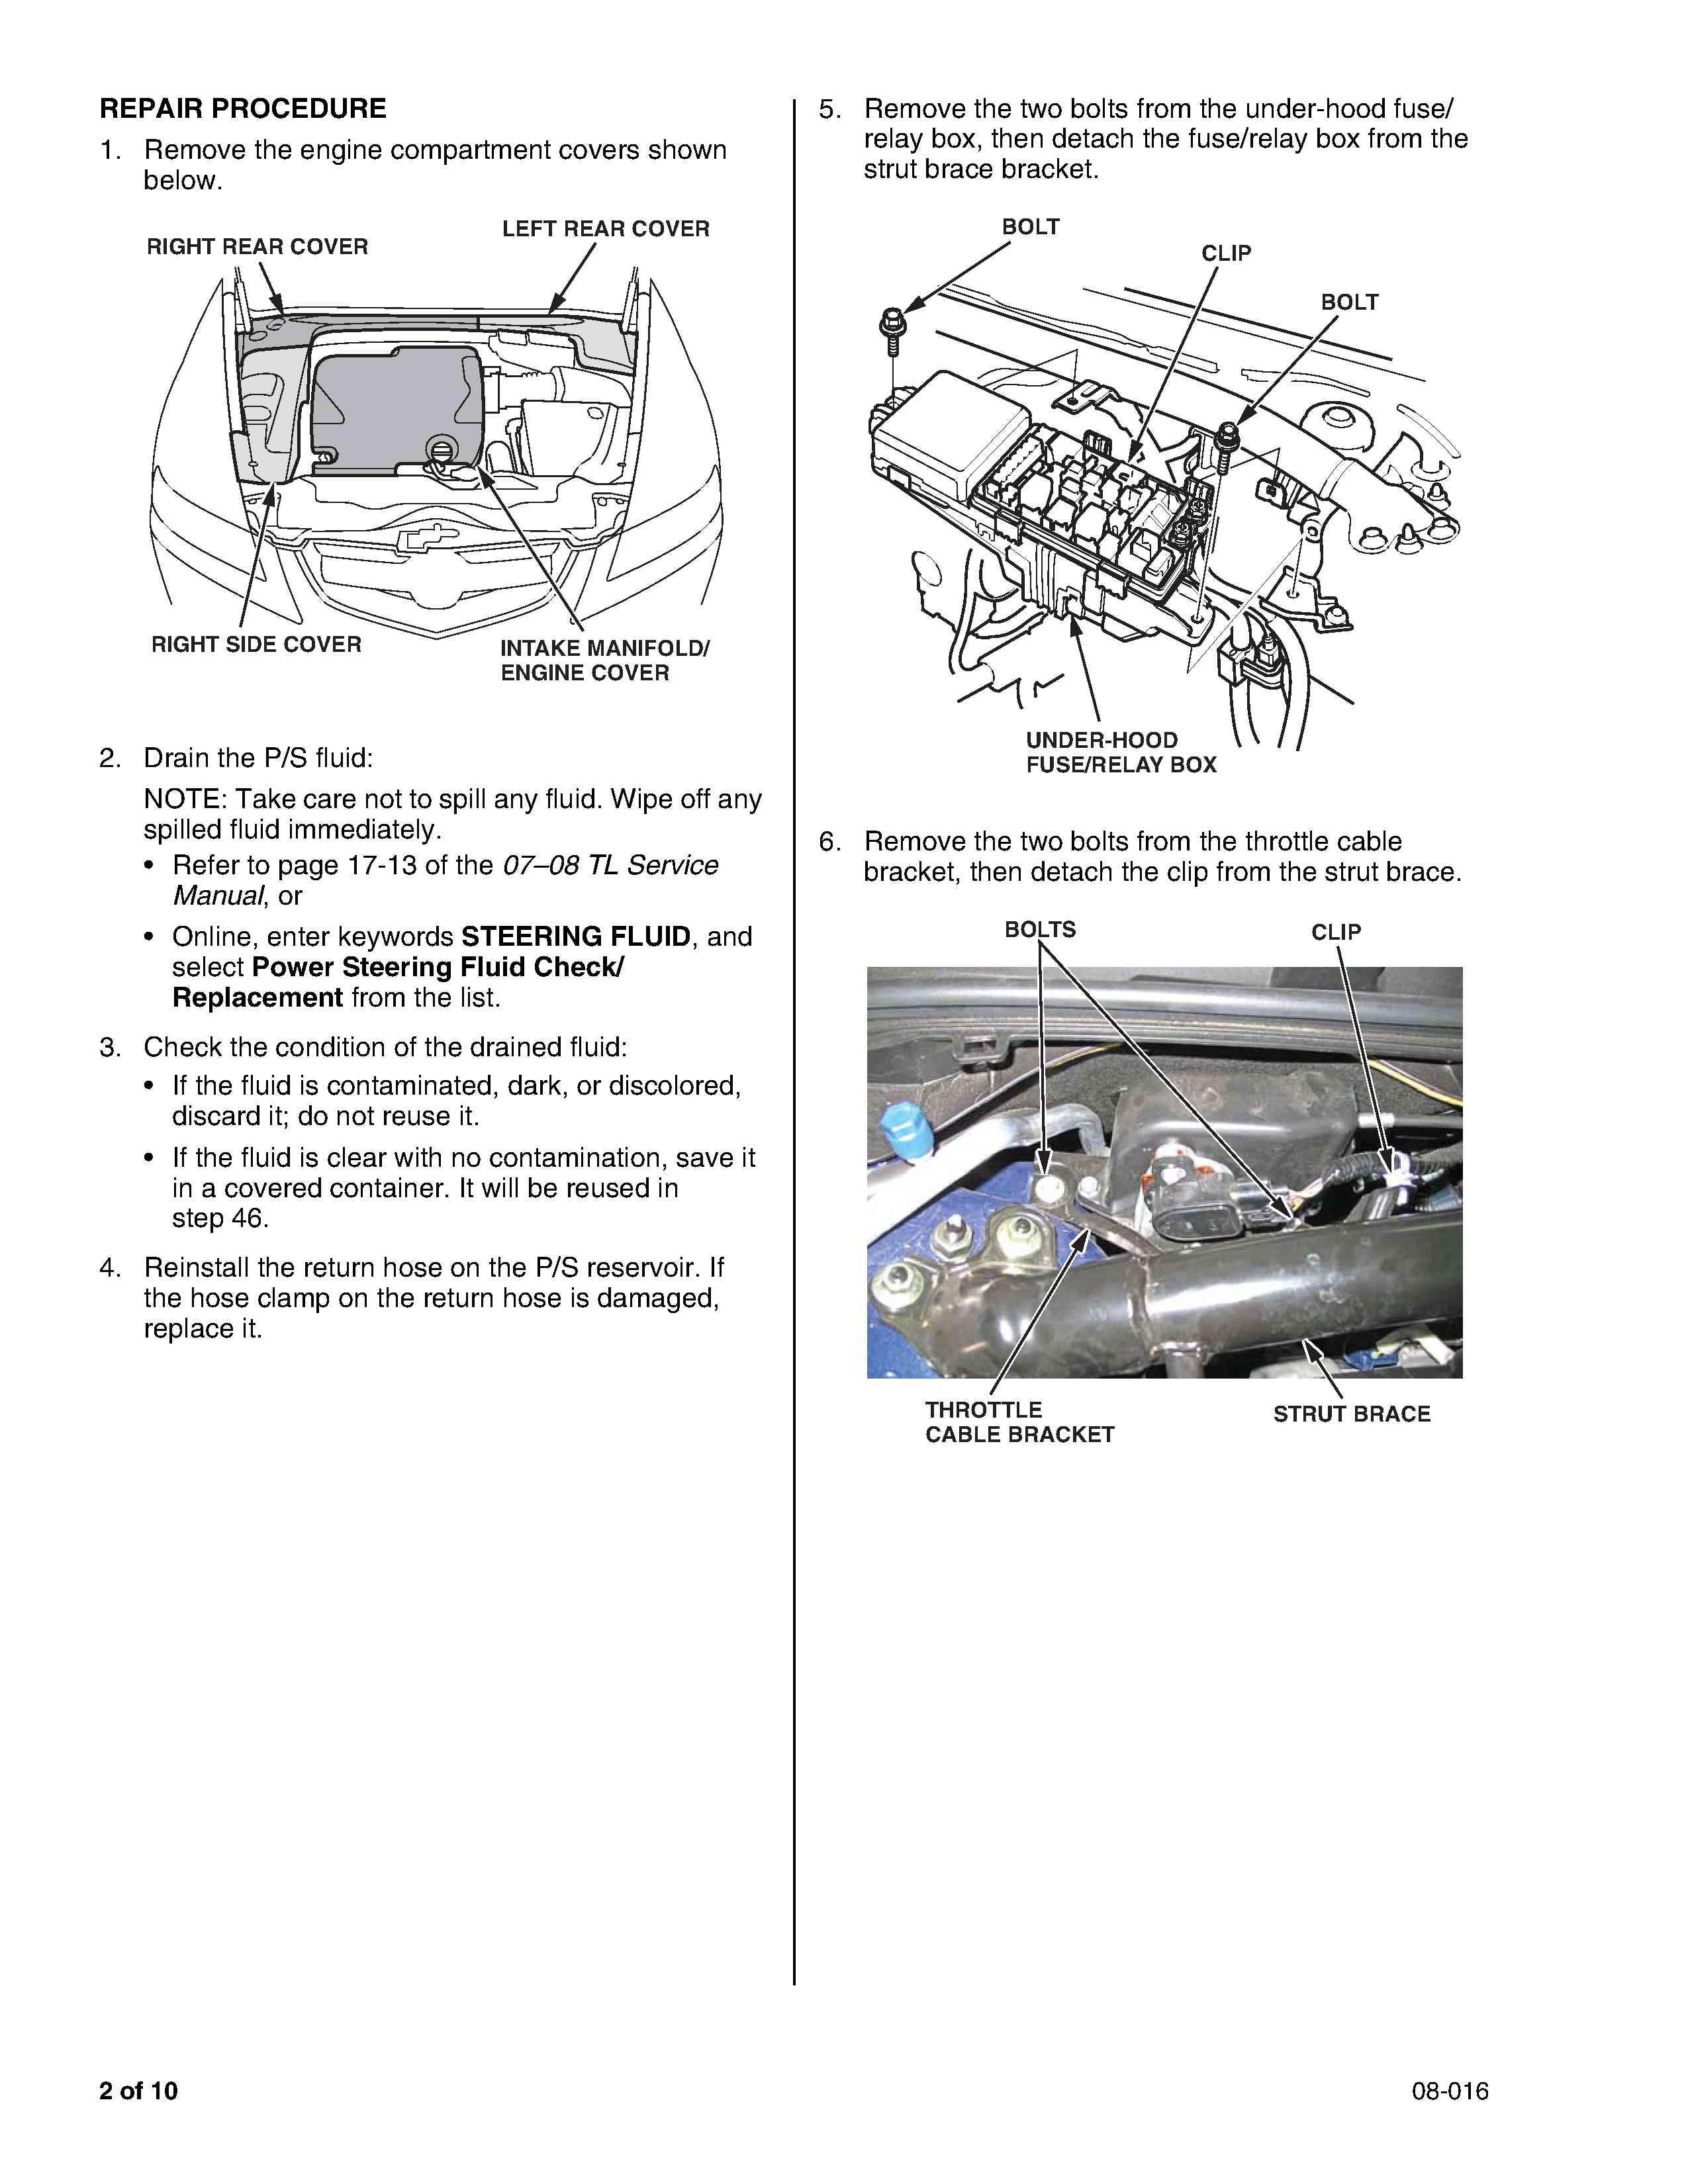 2012 05 16_014813_tl_power_steering_pressure_hose_recall2 dnd330 wiring diagram,wiring \u2022 woorishop co Wiring Packard for Diagram Tqs81 at nearapp.co